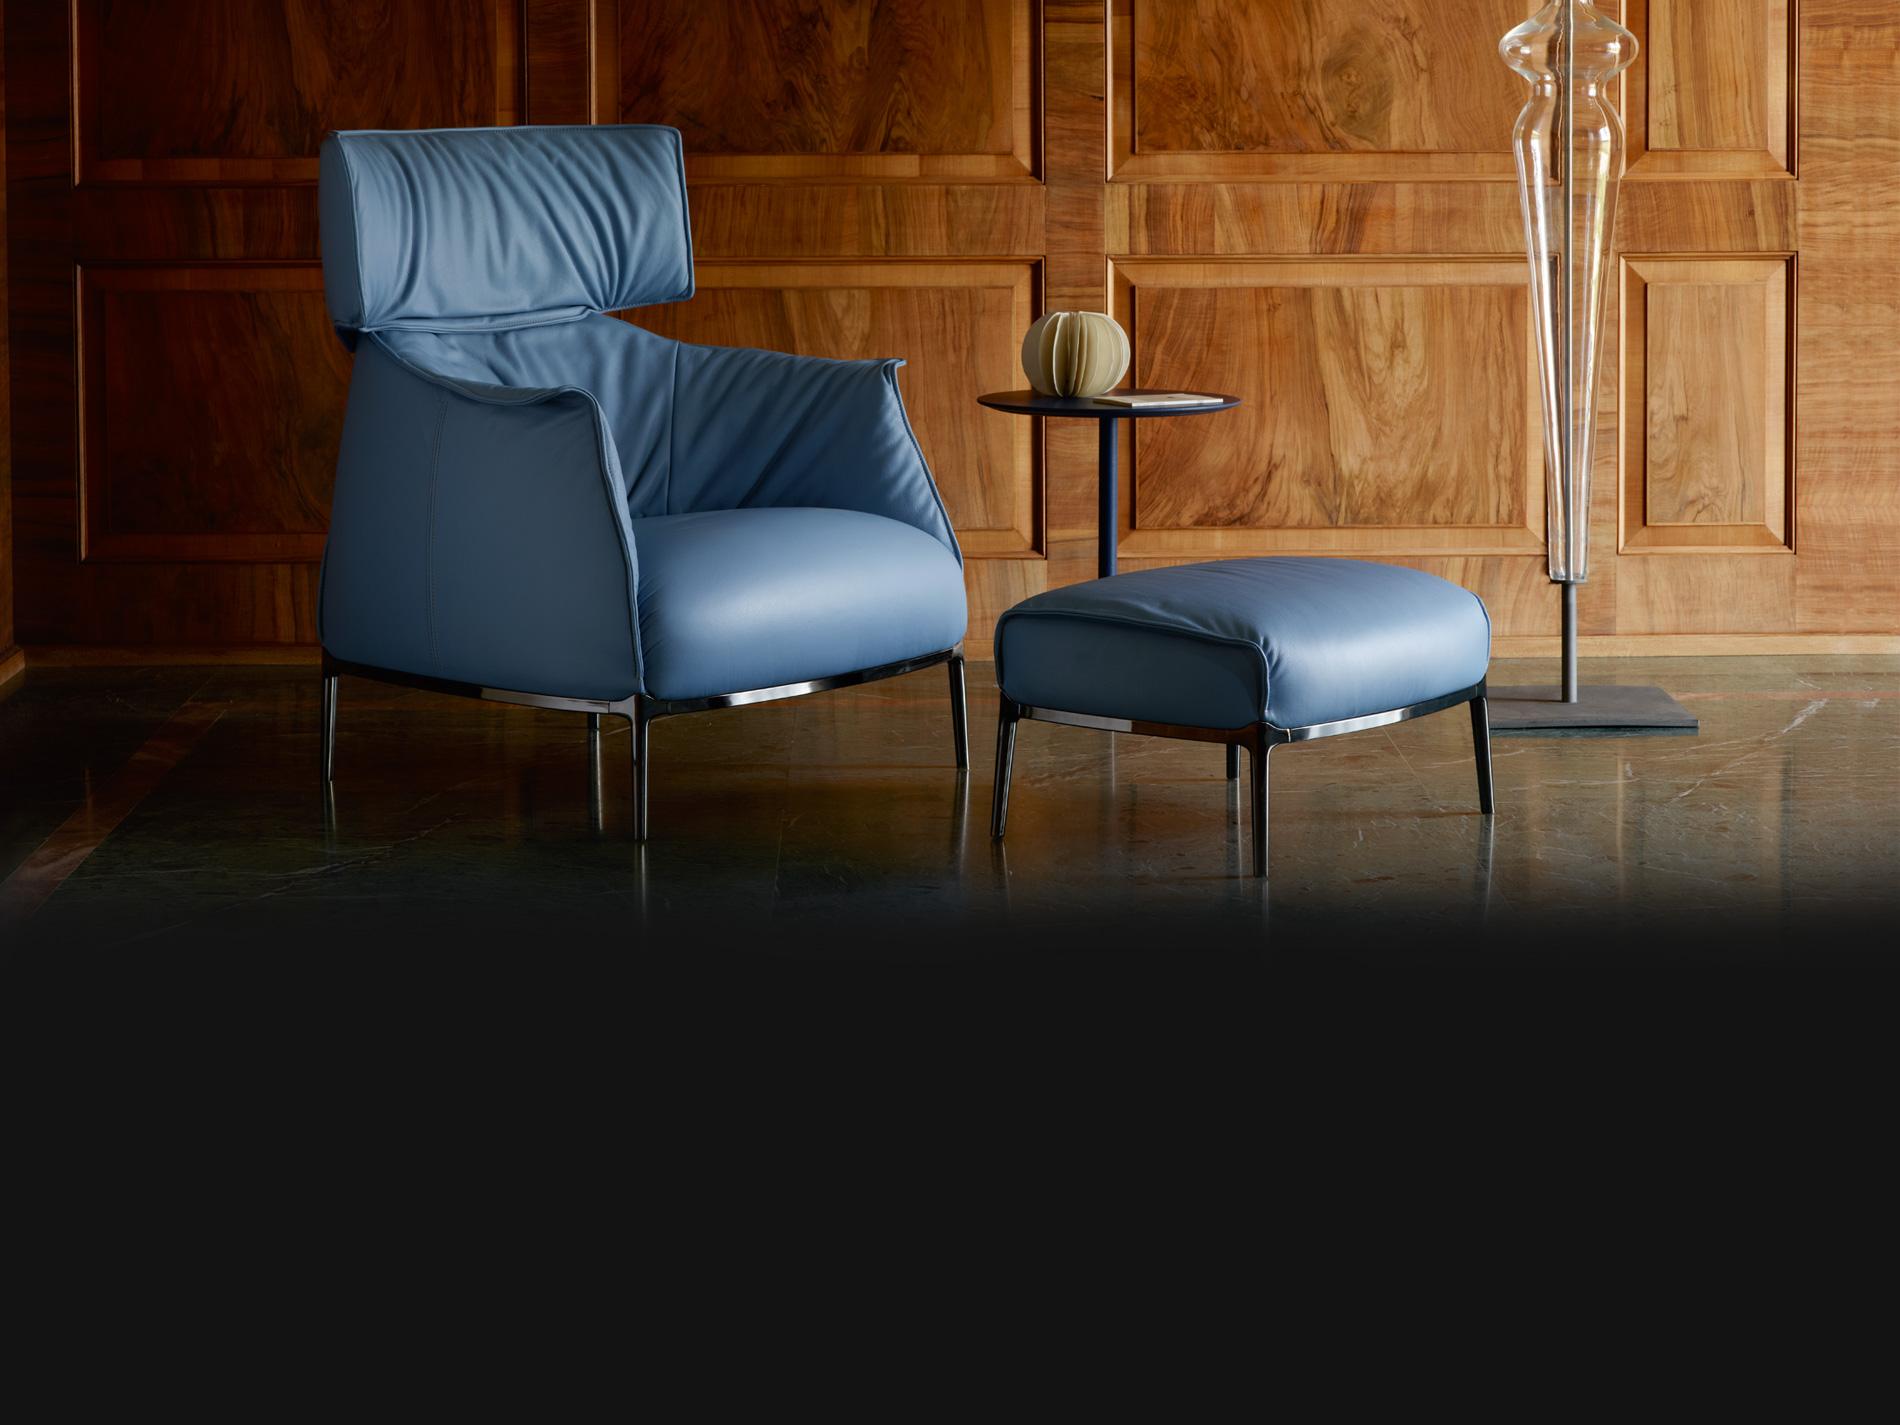 productos poltrona frau de dise o gunni trentino. Black Bedroom Furniture Sets. Home Design Ideas